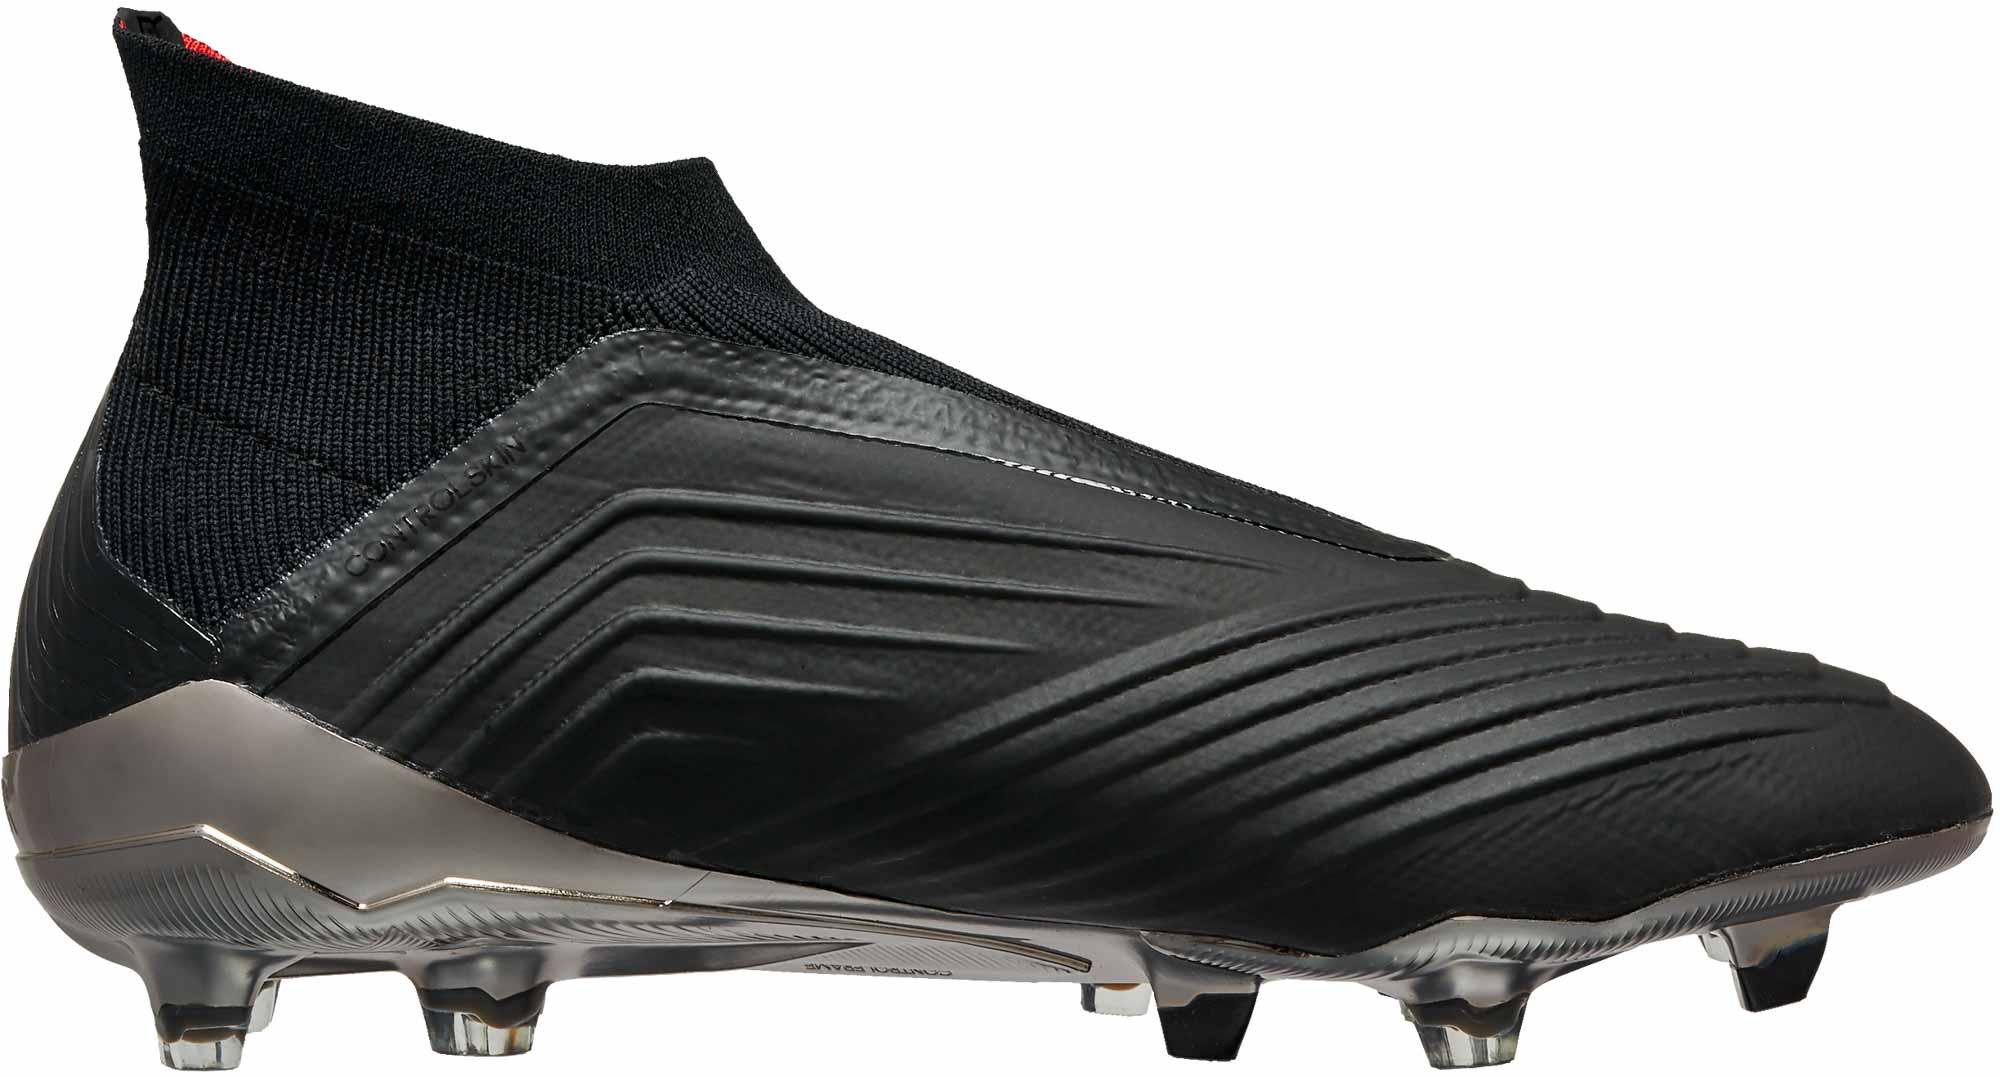 adidas Predator 18 FG - Black adidas Soccer Cleats c574aa73e